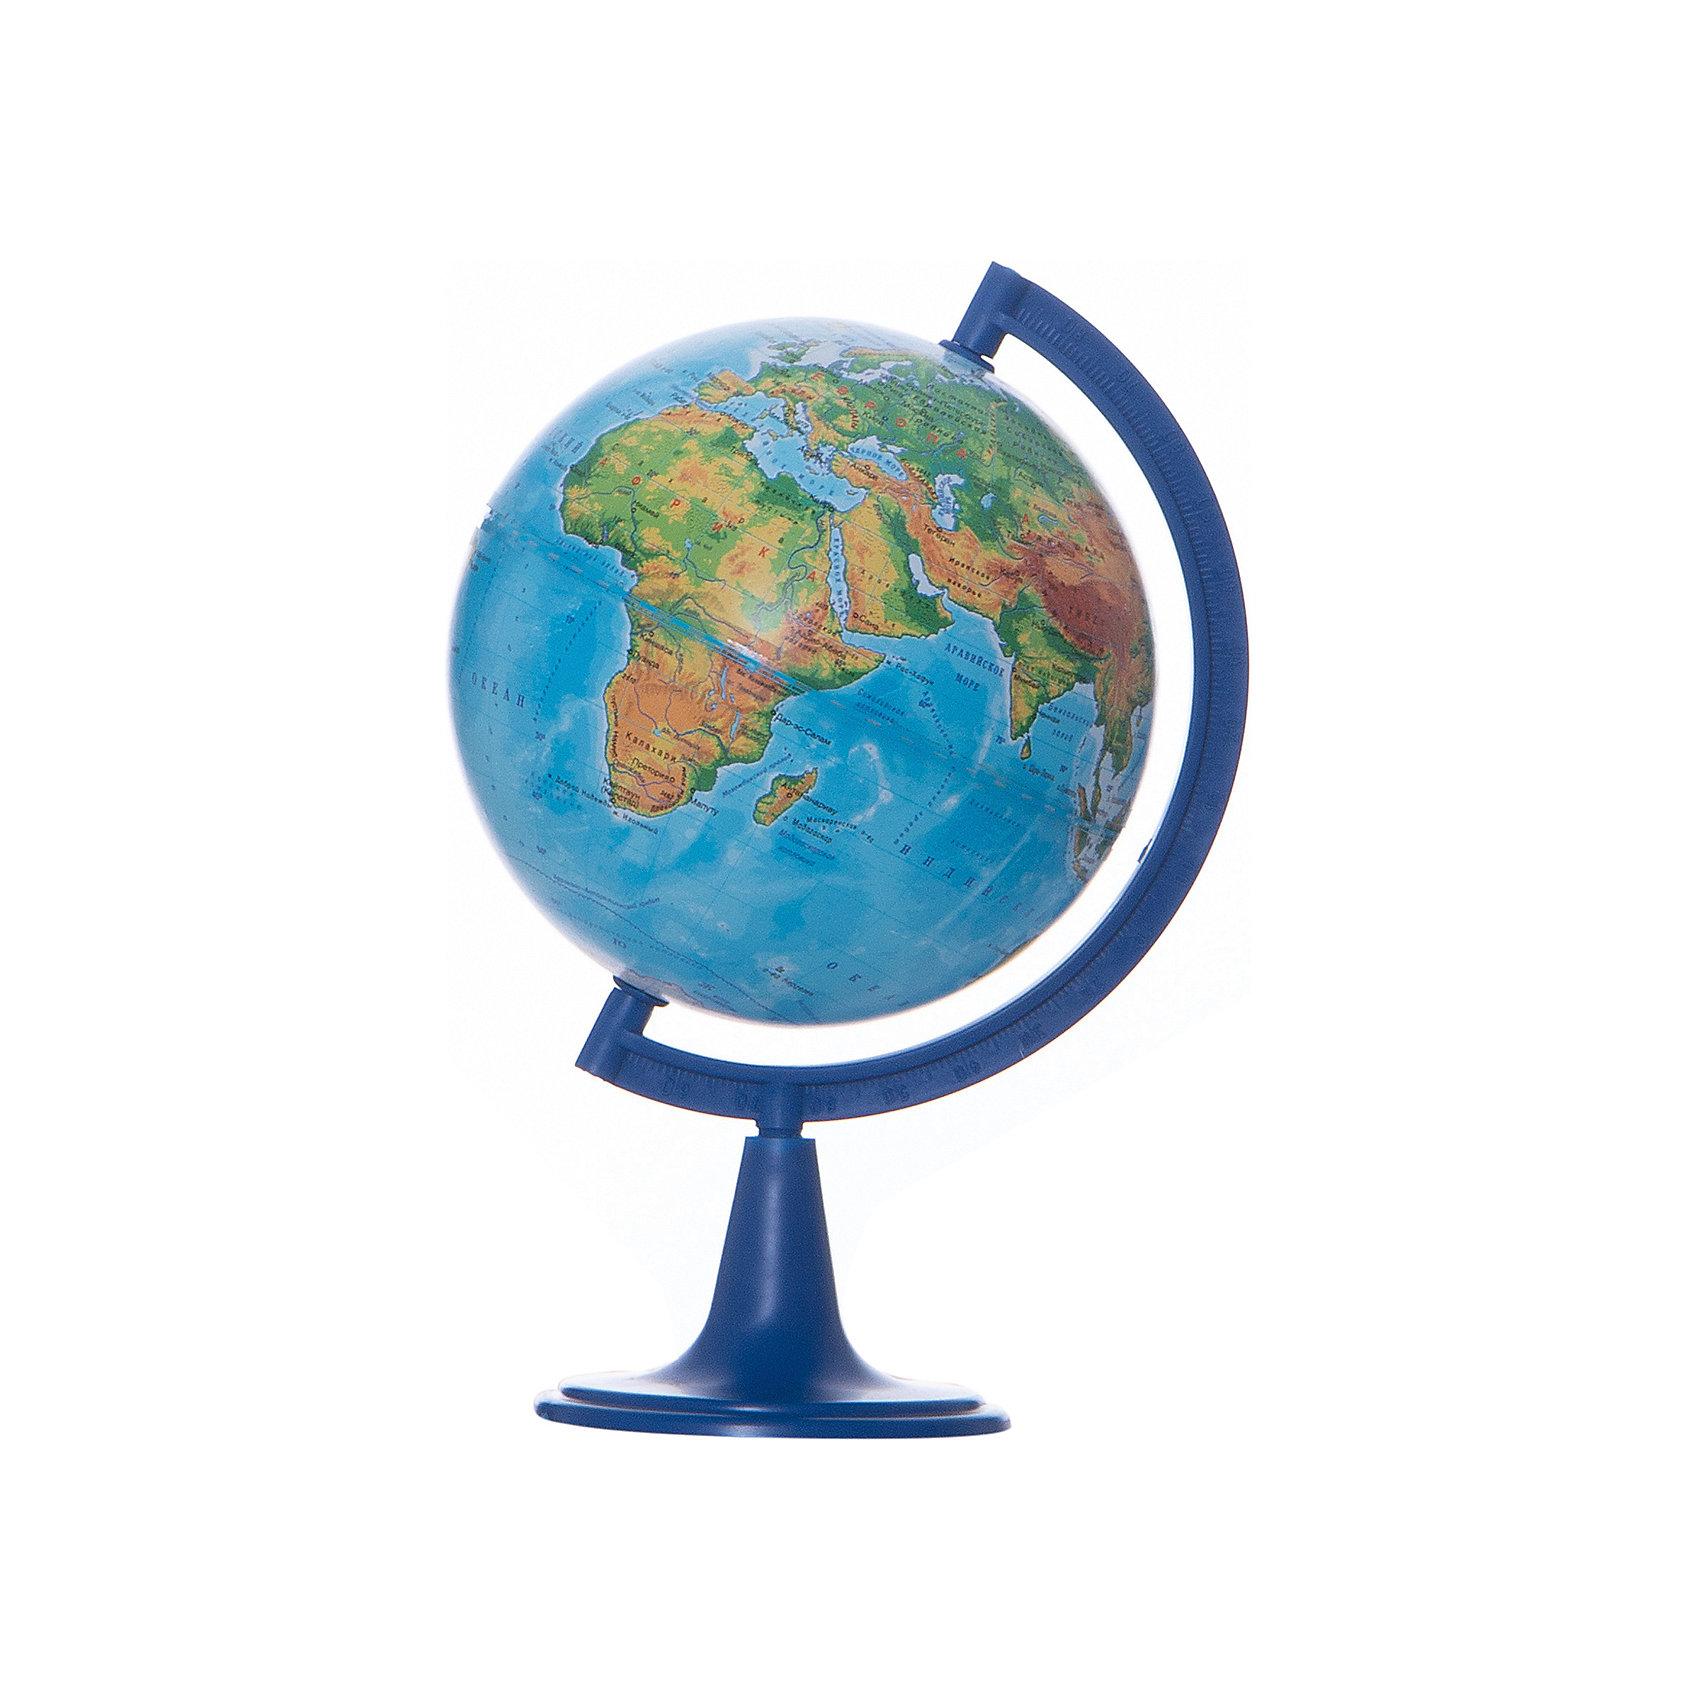 Глобус Земли физический, диаметр 150 ммДиаметр: 150 мм<br><br>Масштаб: 1:84000000<br><br>Материал подставки: Пластик<br><br>Цвет подставки: Черный<br><br>Ширина мм: 160<br>Глубина мм: 160<br>Высота мм: 250<br>Вес г: 350<br>Возраст от месяцев: 72<br>Возраст до месяцев: 2147483647<br>Пол: Унисекс<br>Возраст: Детский<br>SKU: 5518210